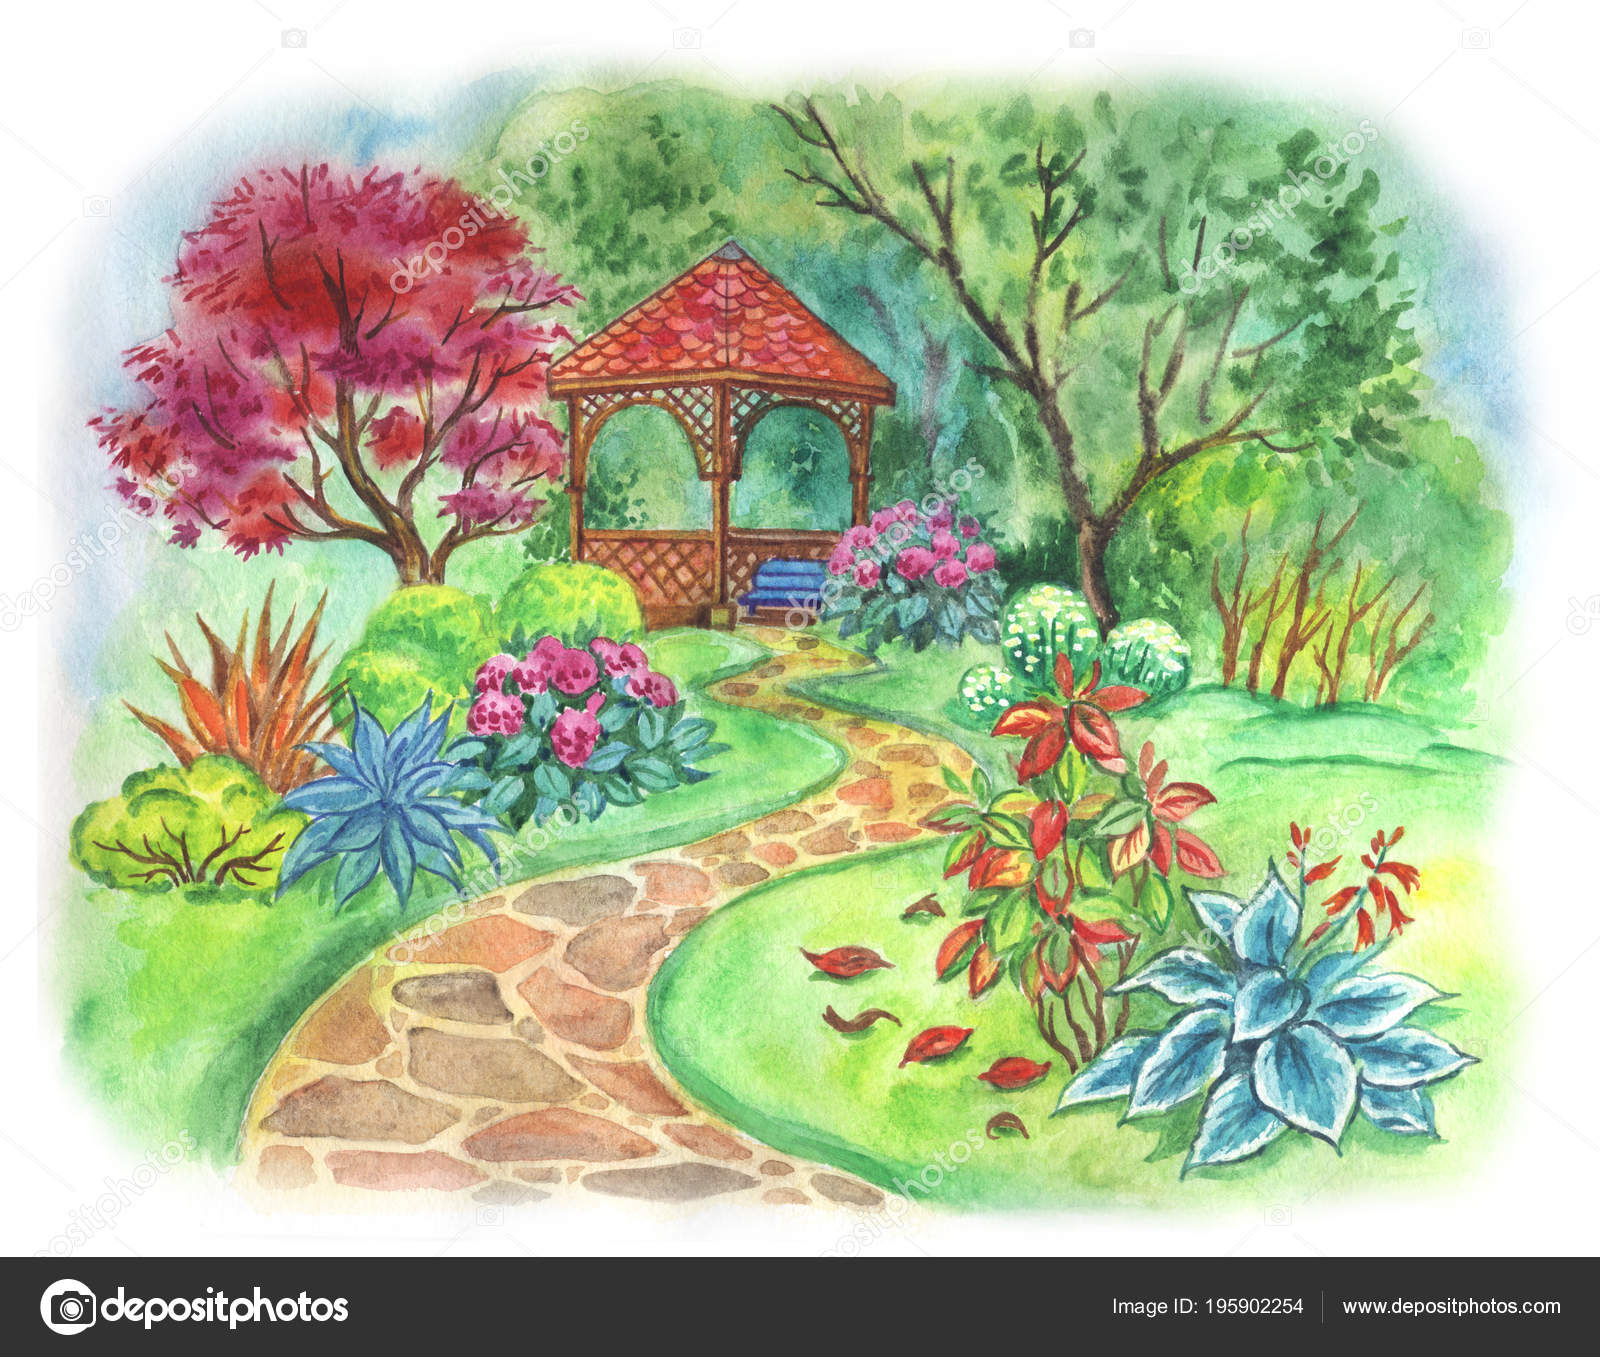 Arbor Green Garden Trees Bushes Watercolor Drawing \u2014 Stock